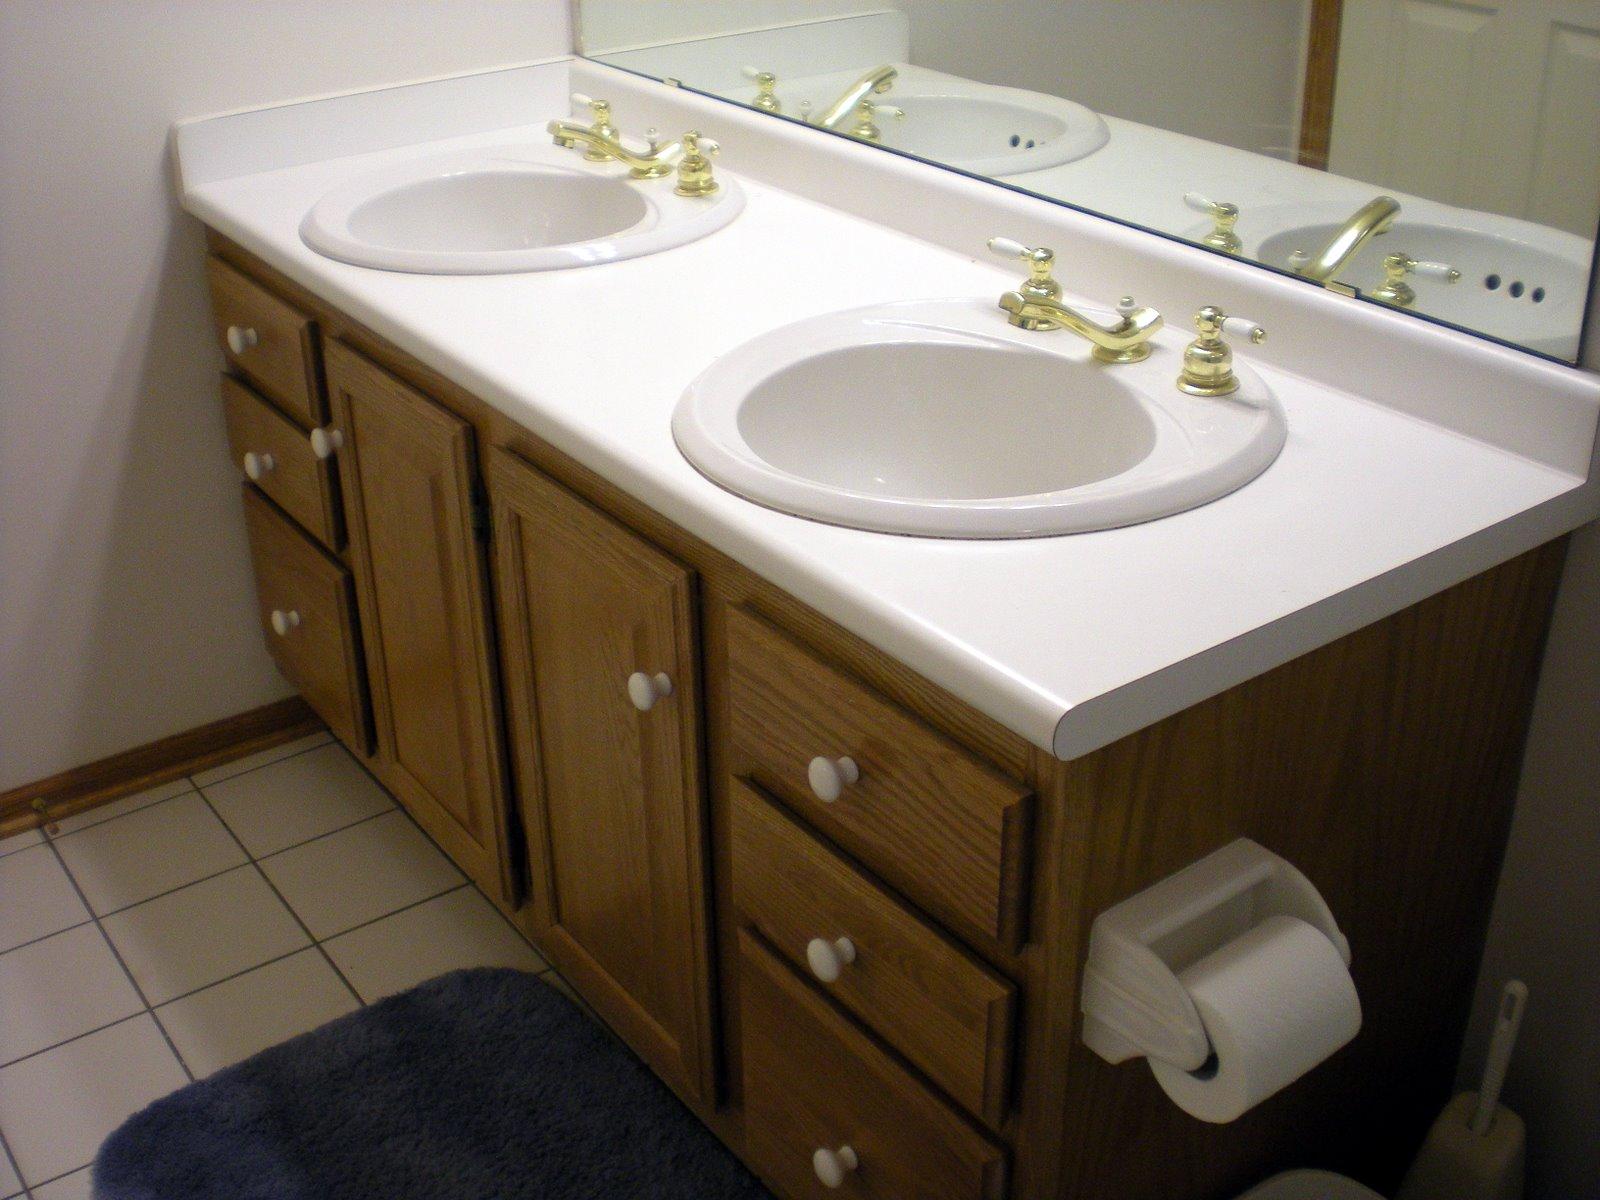 Wonderful 14 Bathroom Fixtures Amp Plumbing Accessories Faucets Showers Flush